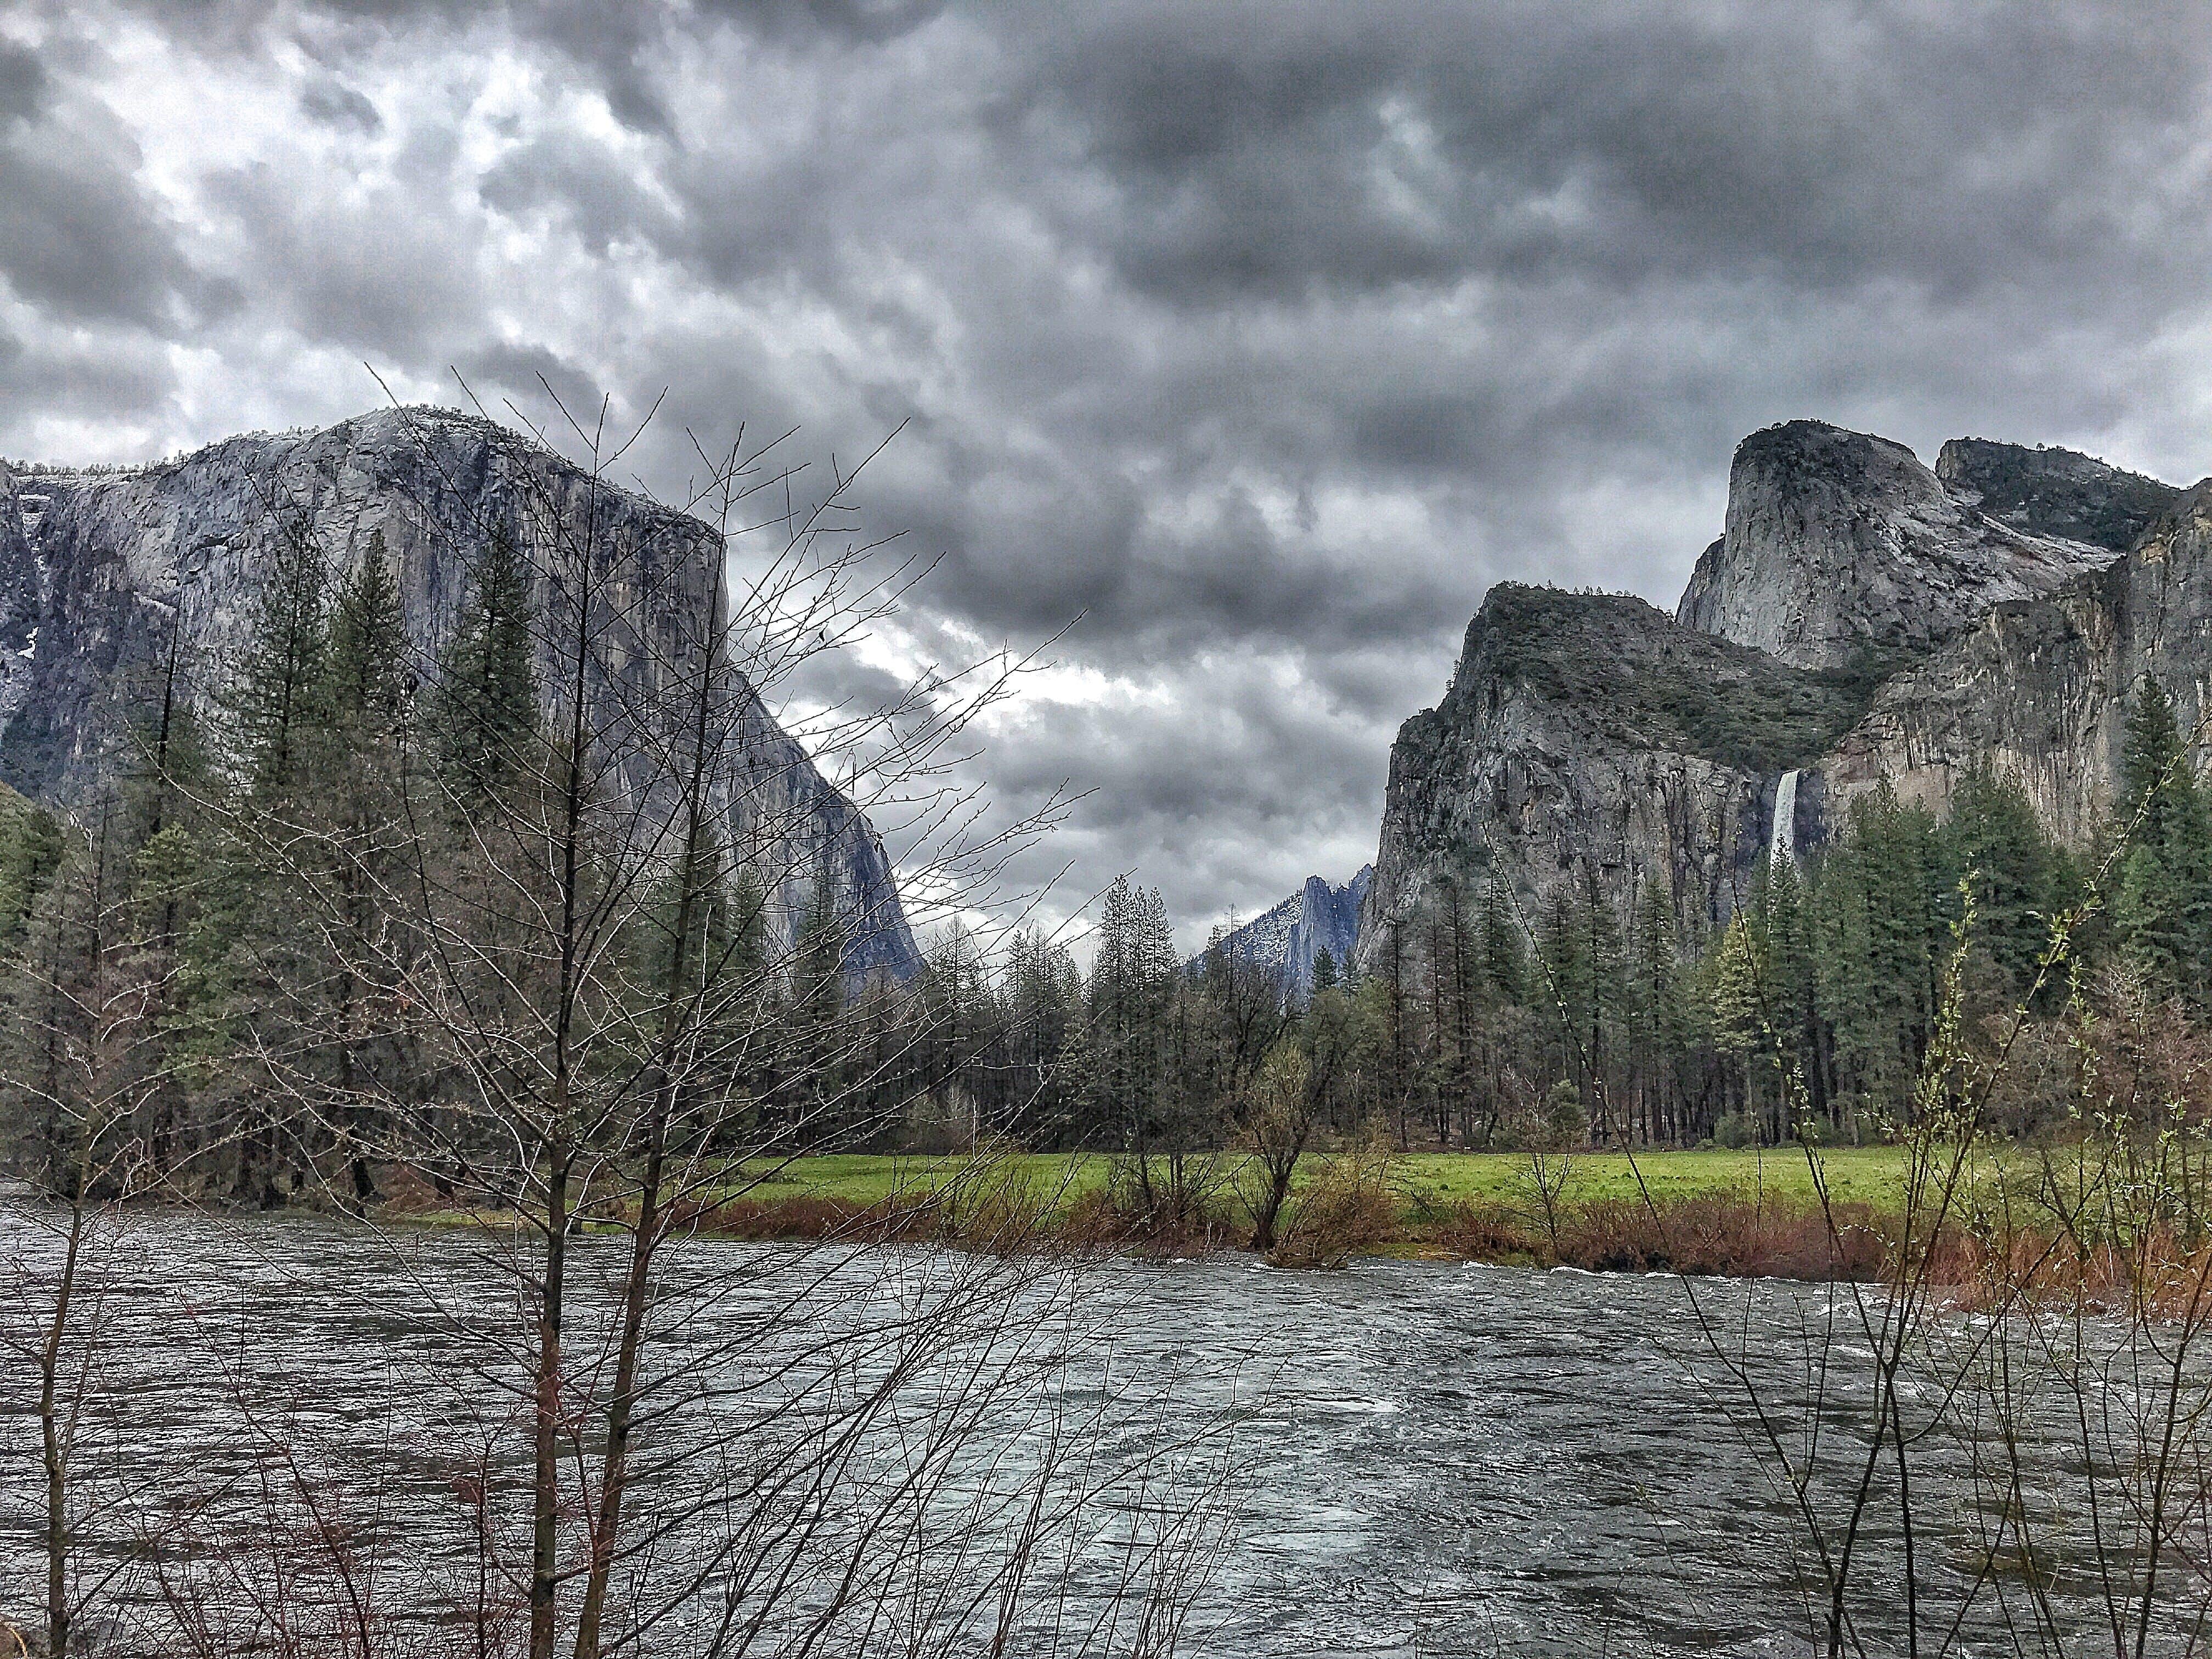 Body of Water Near Rocky Mountains